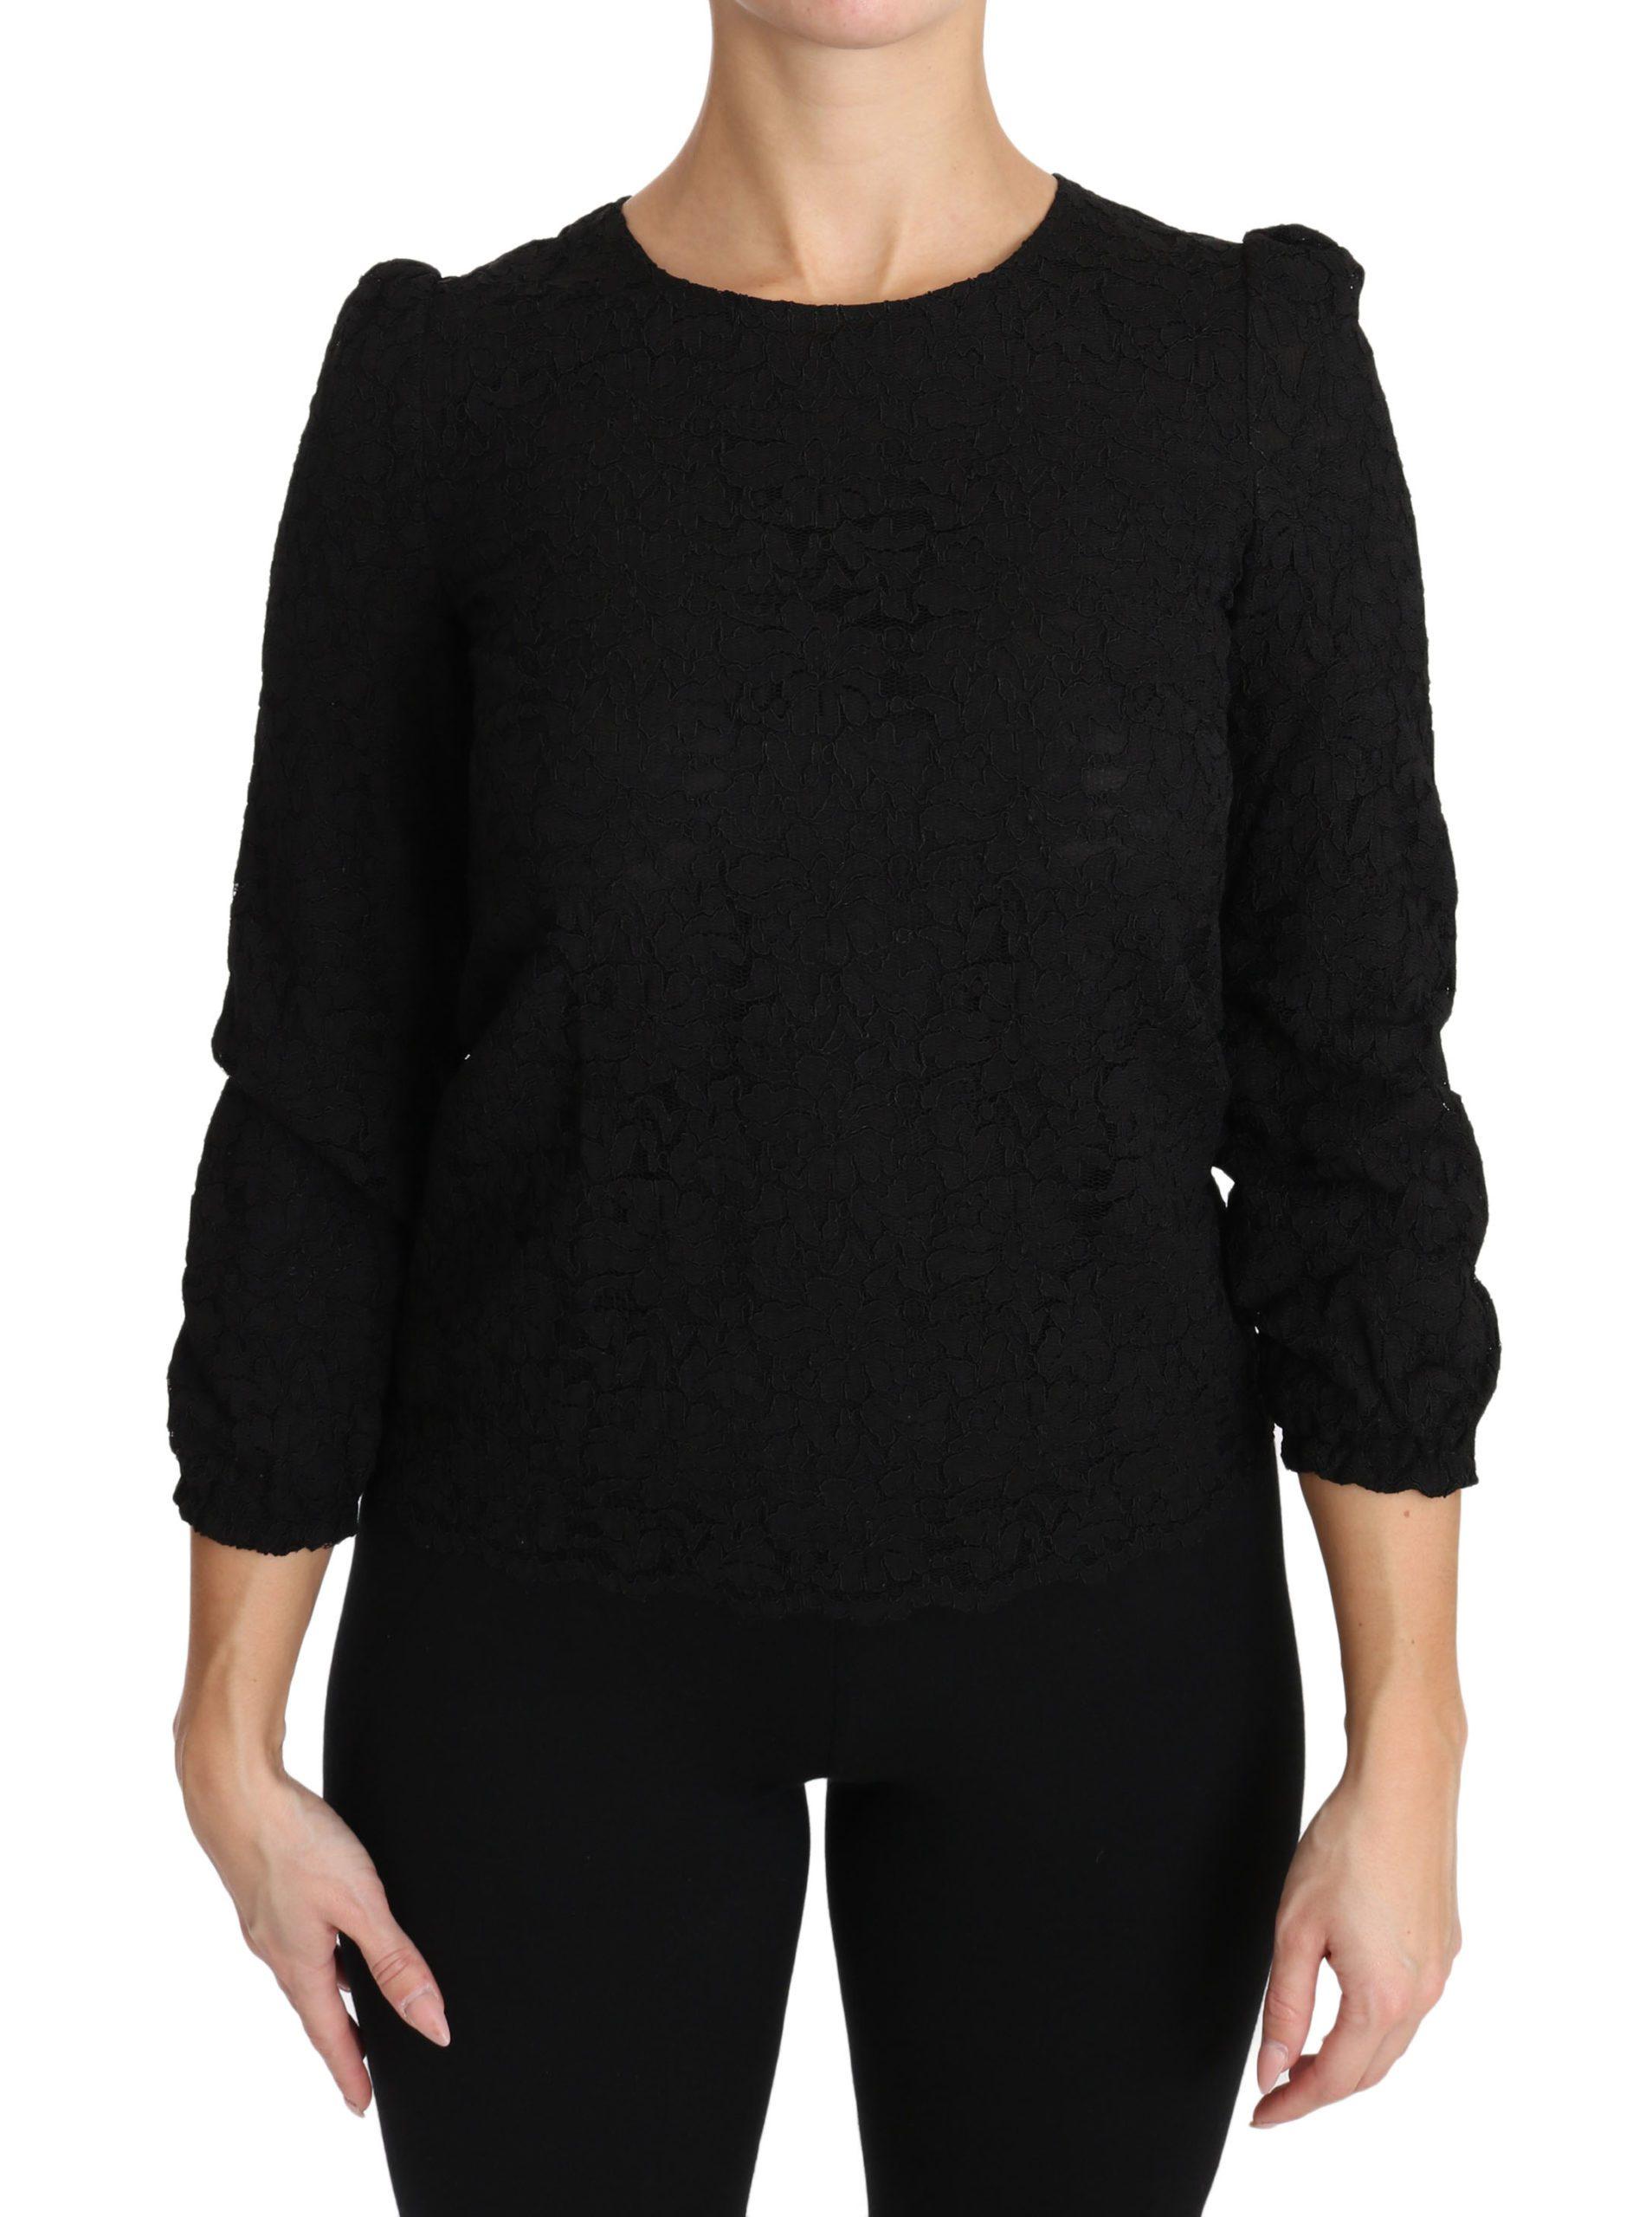 Dolce & Gabbana Women's Floral Lace Zipper Top Black TSH3029 - IT36 | XS